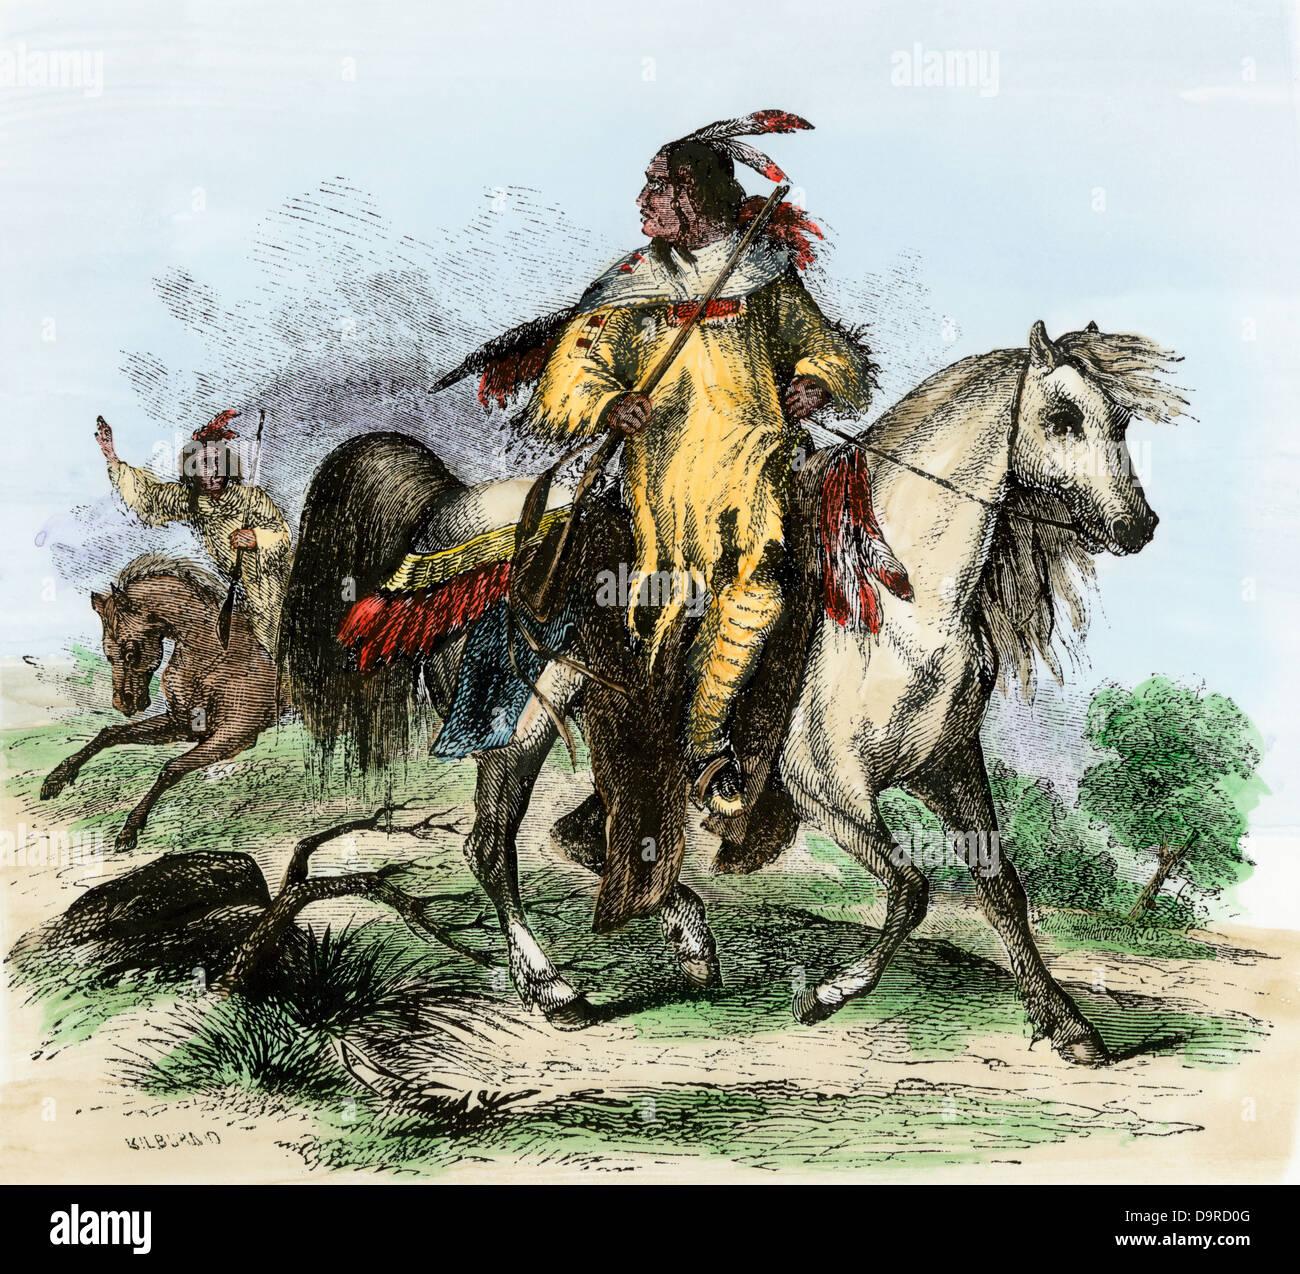 Blackfeet warriors carrying guns on horseback, 1850s. Hand-colored woodcut - Stock Image